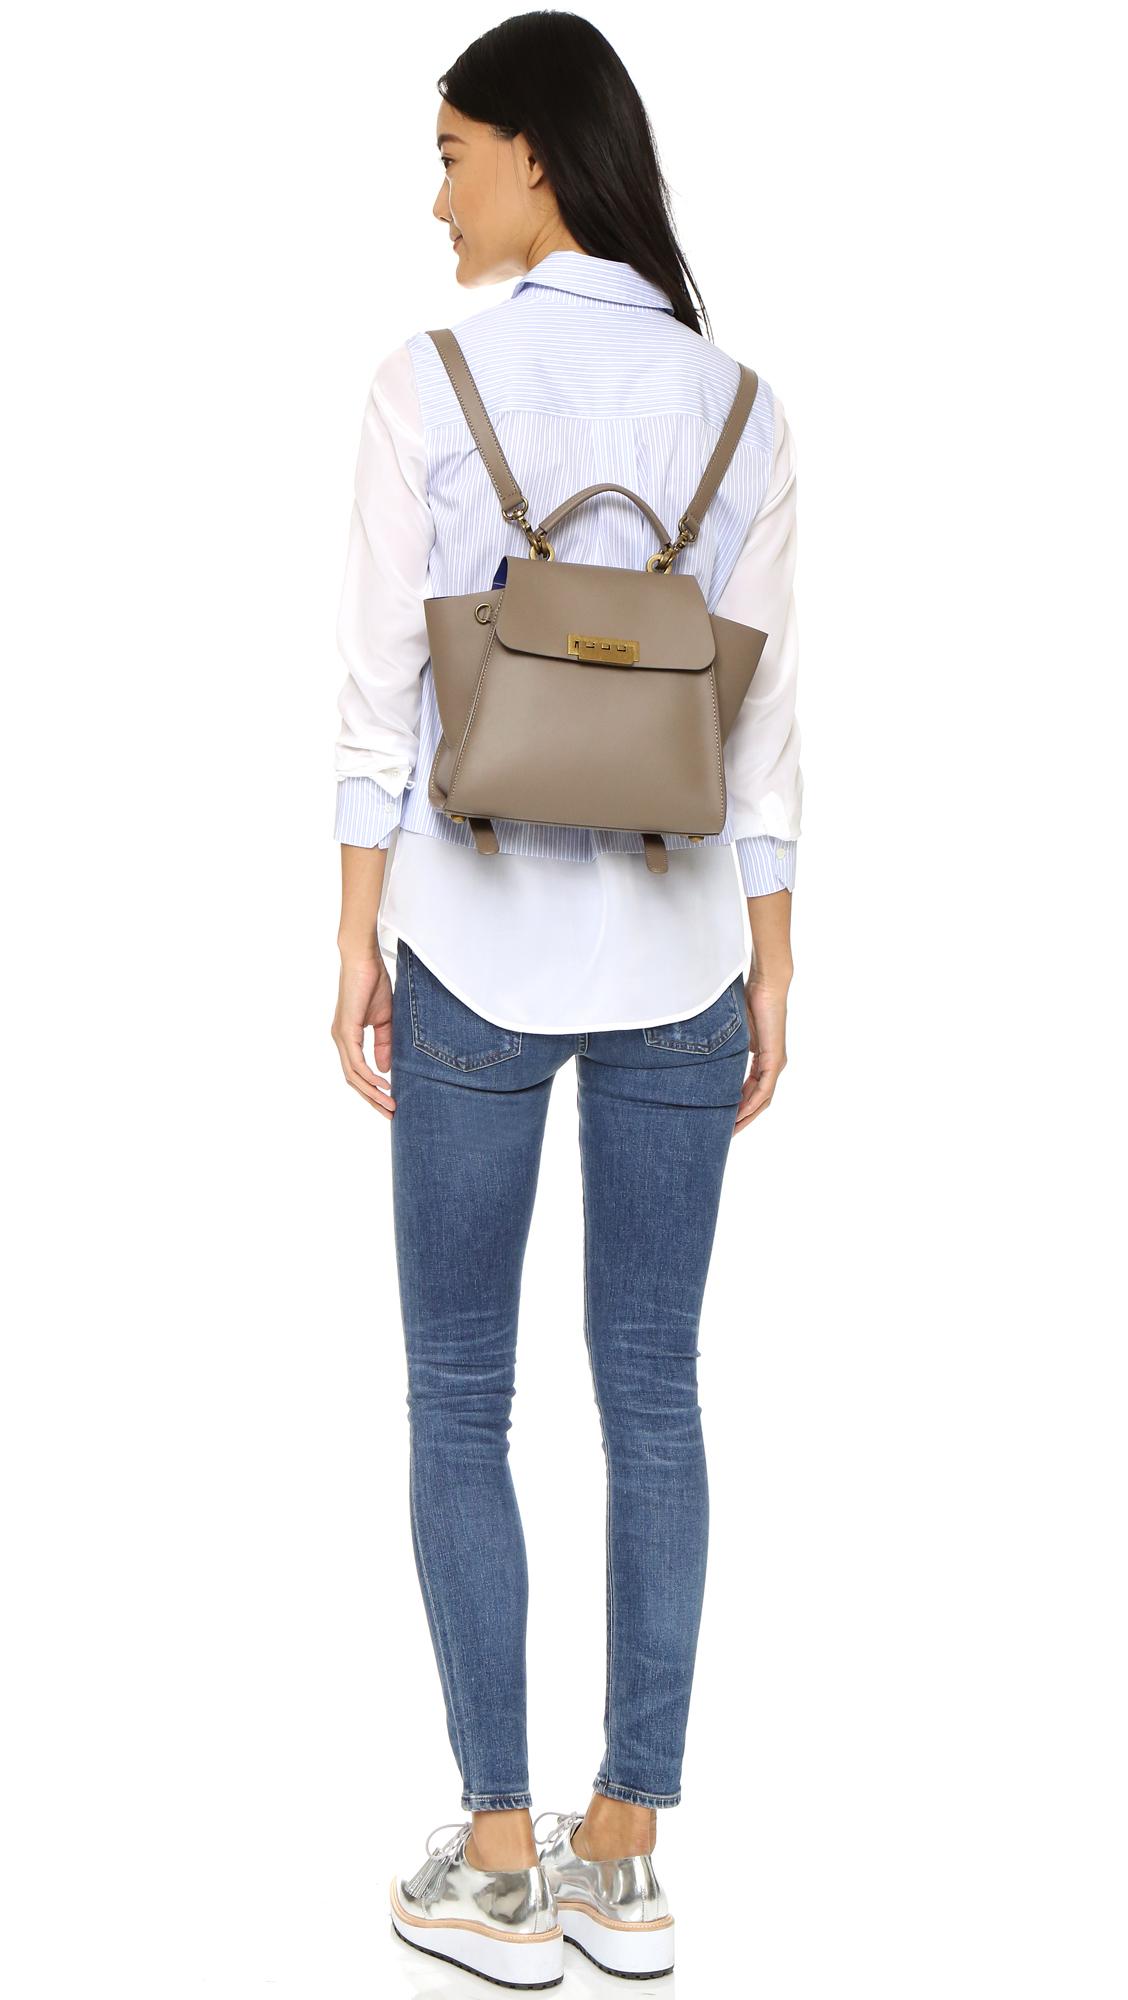 Zac Zac Posen Eartha Iconic Convertible Backpack In Gray